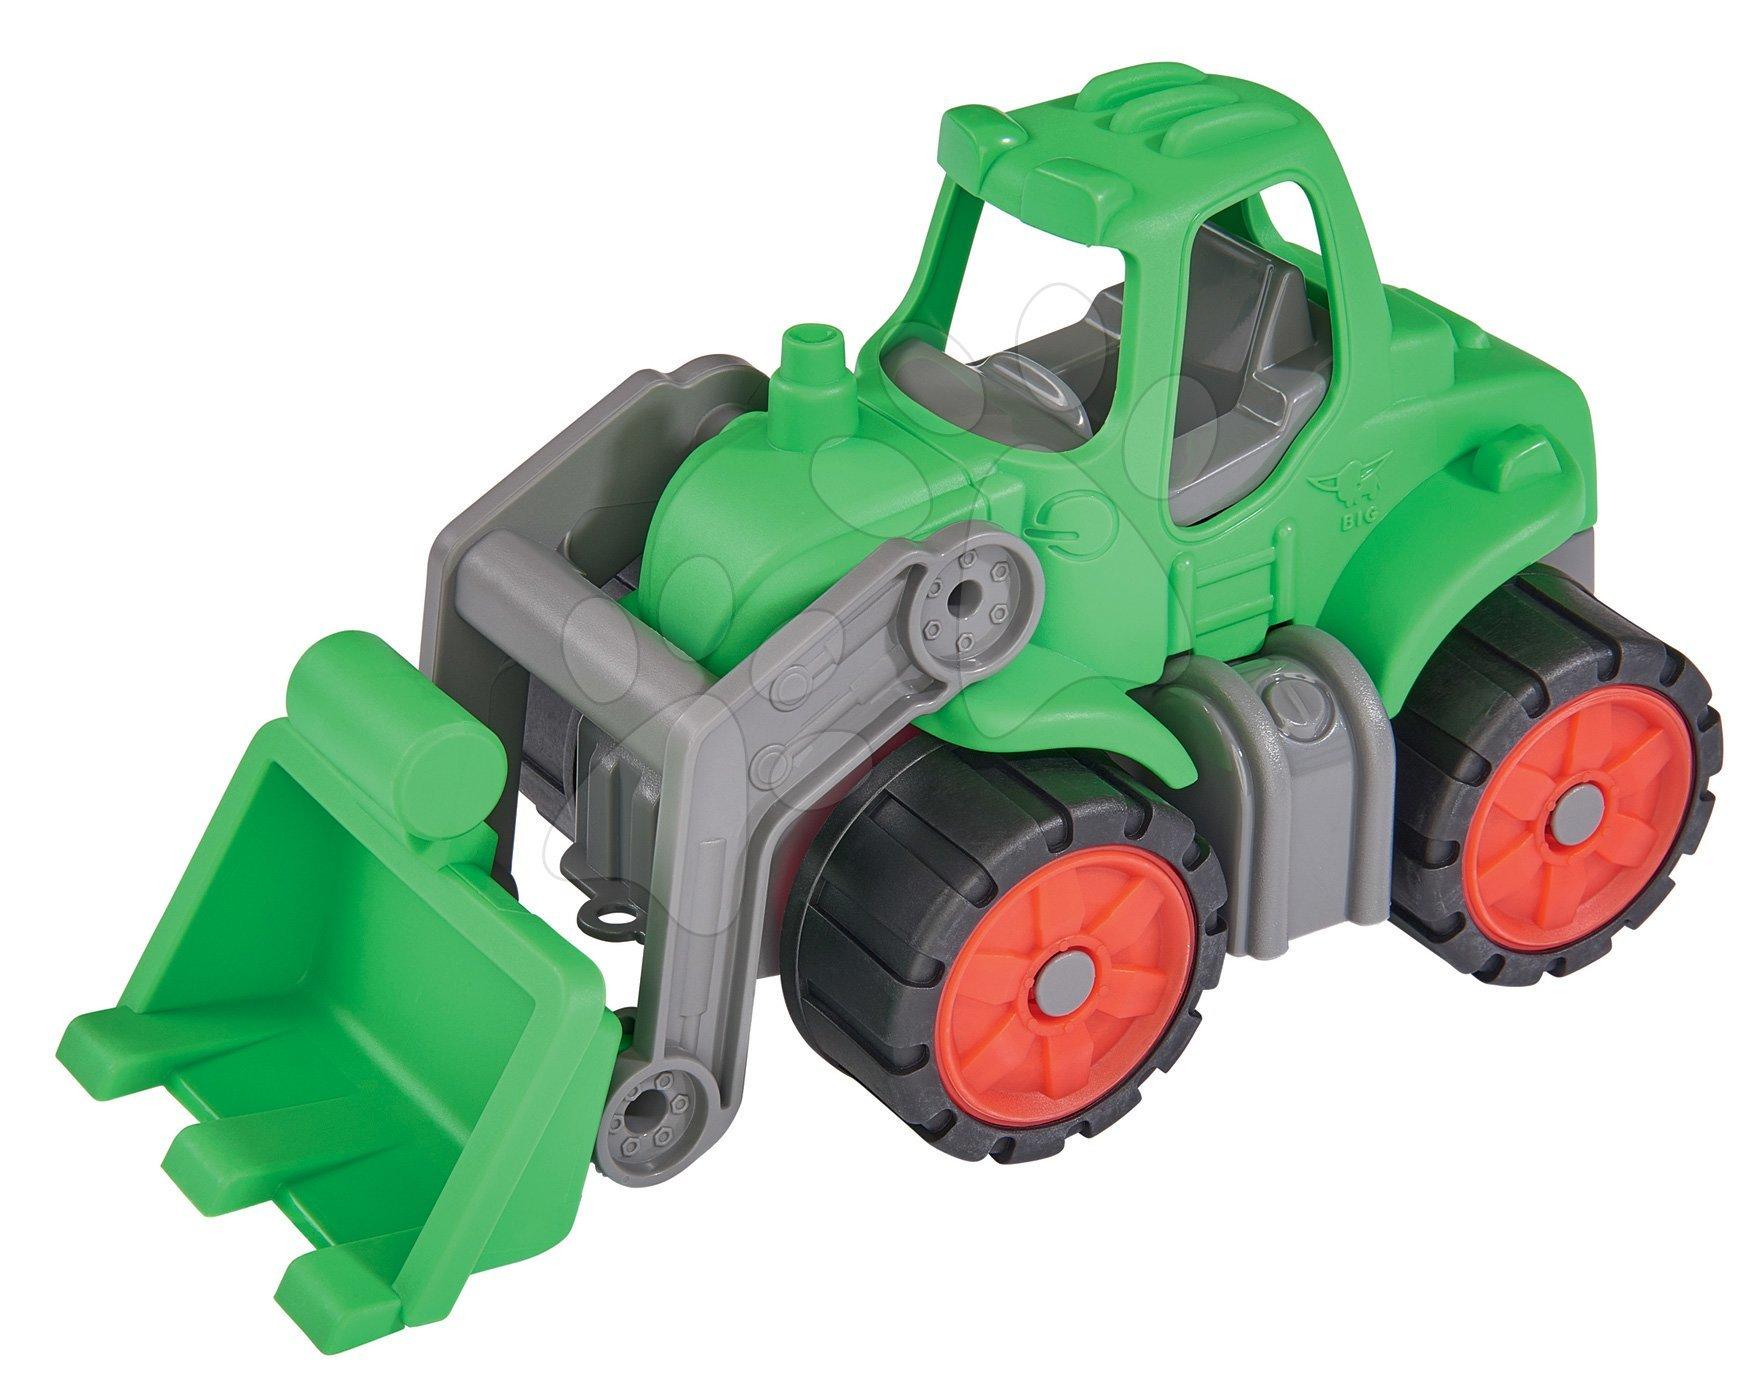 Poľnohospodárske stroje - Traktor Power BIG dĺžka 23 cm zelený od 24 mes